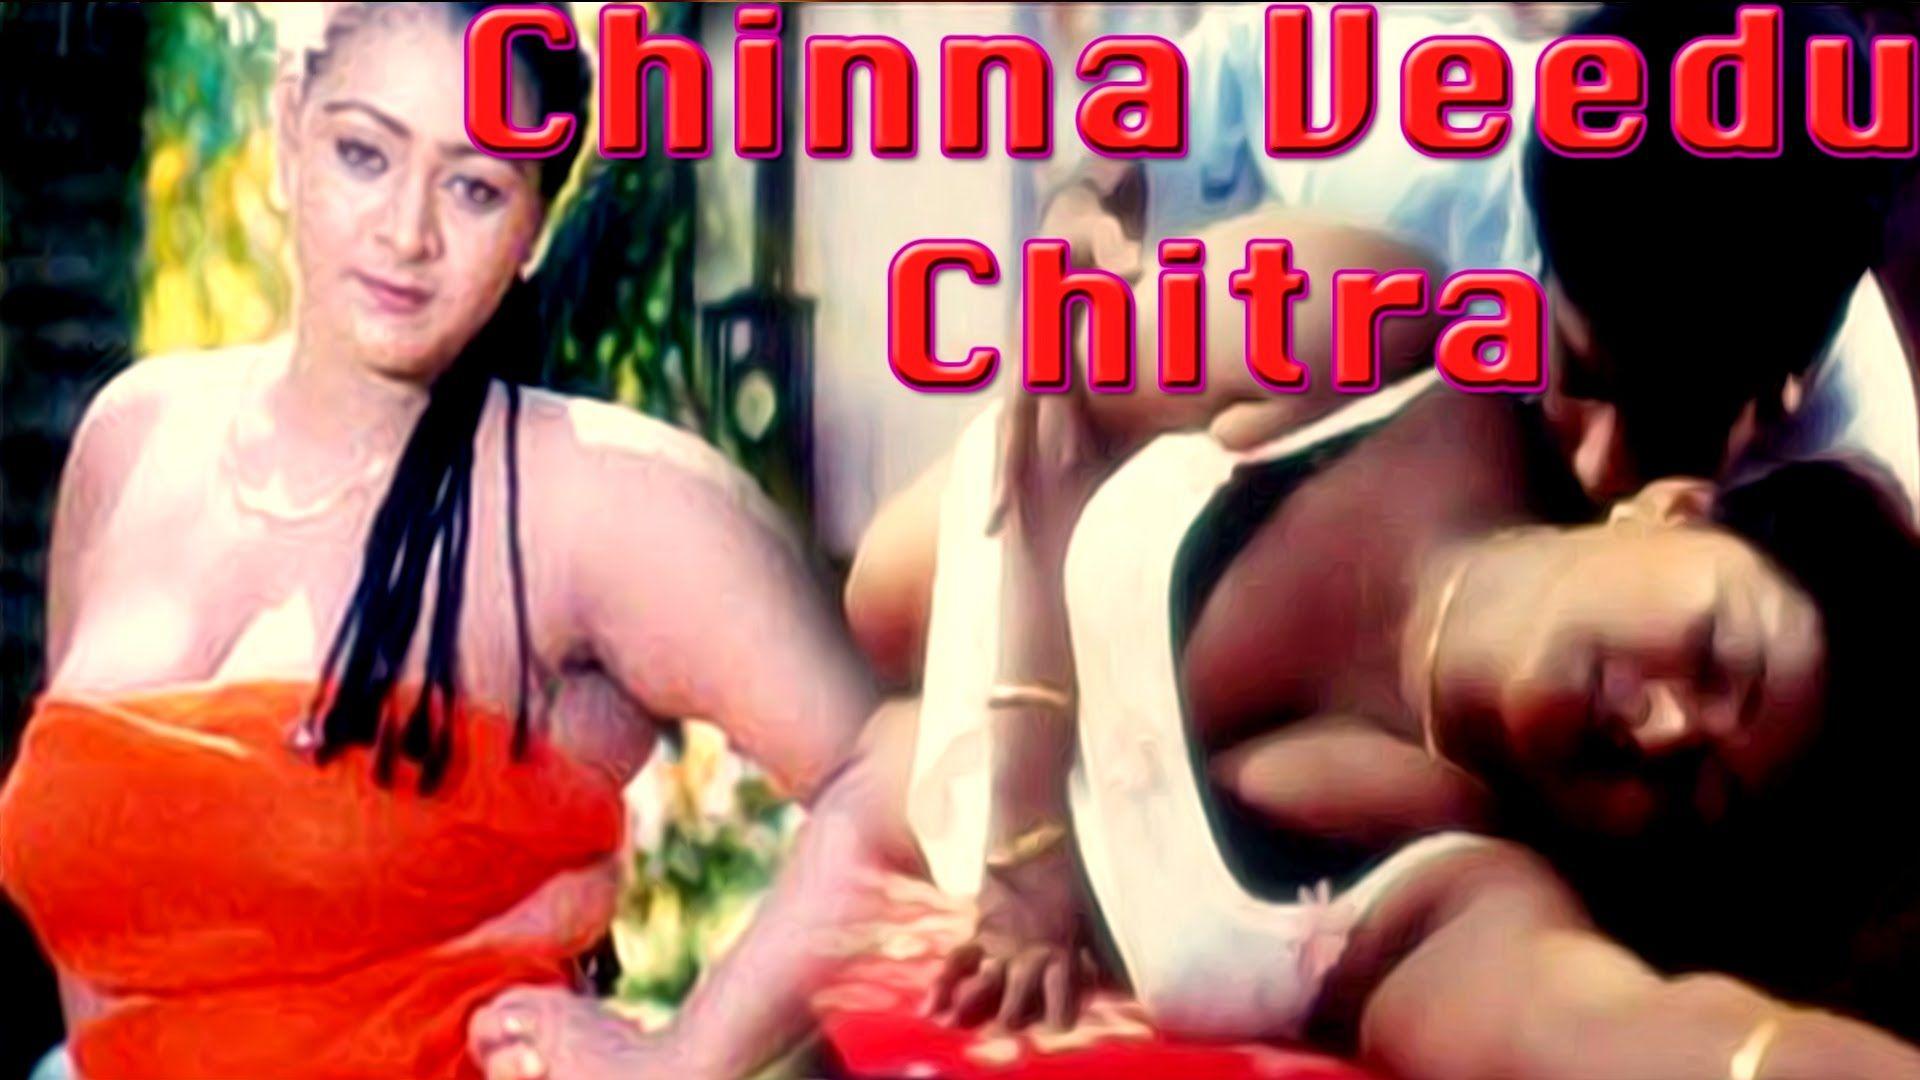 Chinna Veedu Chitra   Superhit Tamil Movie   Shakila   Ramesh   Chitra